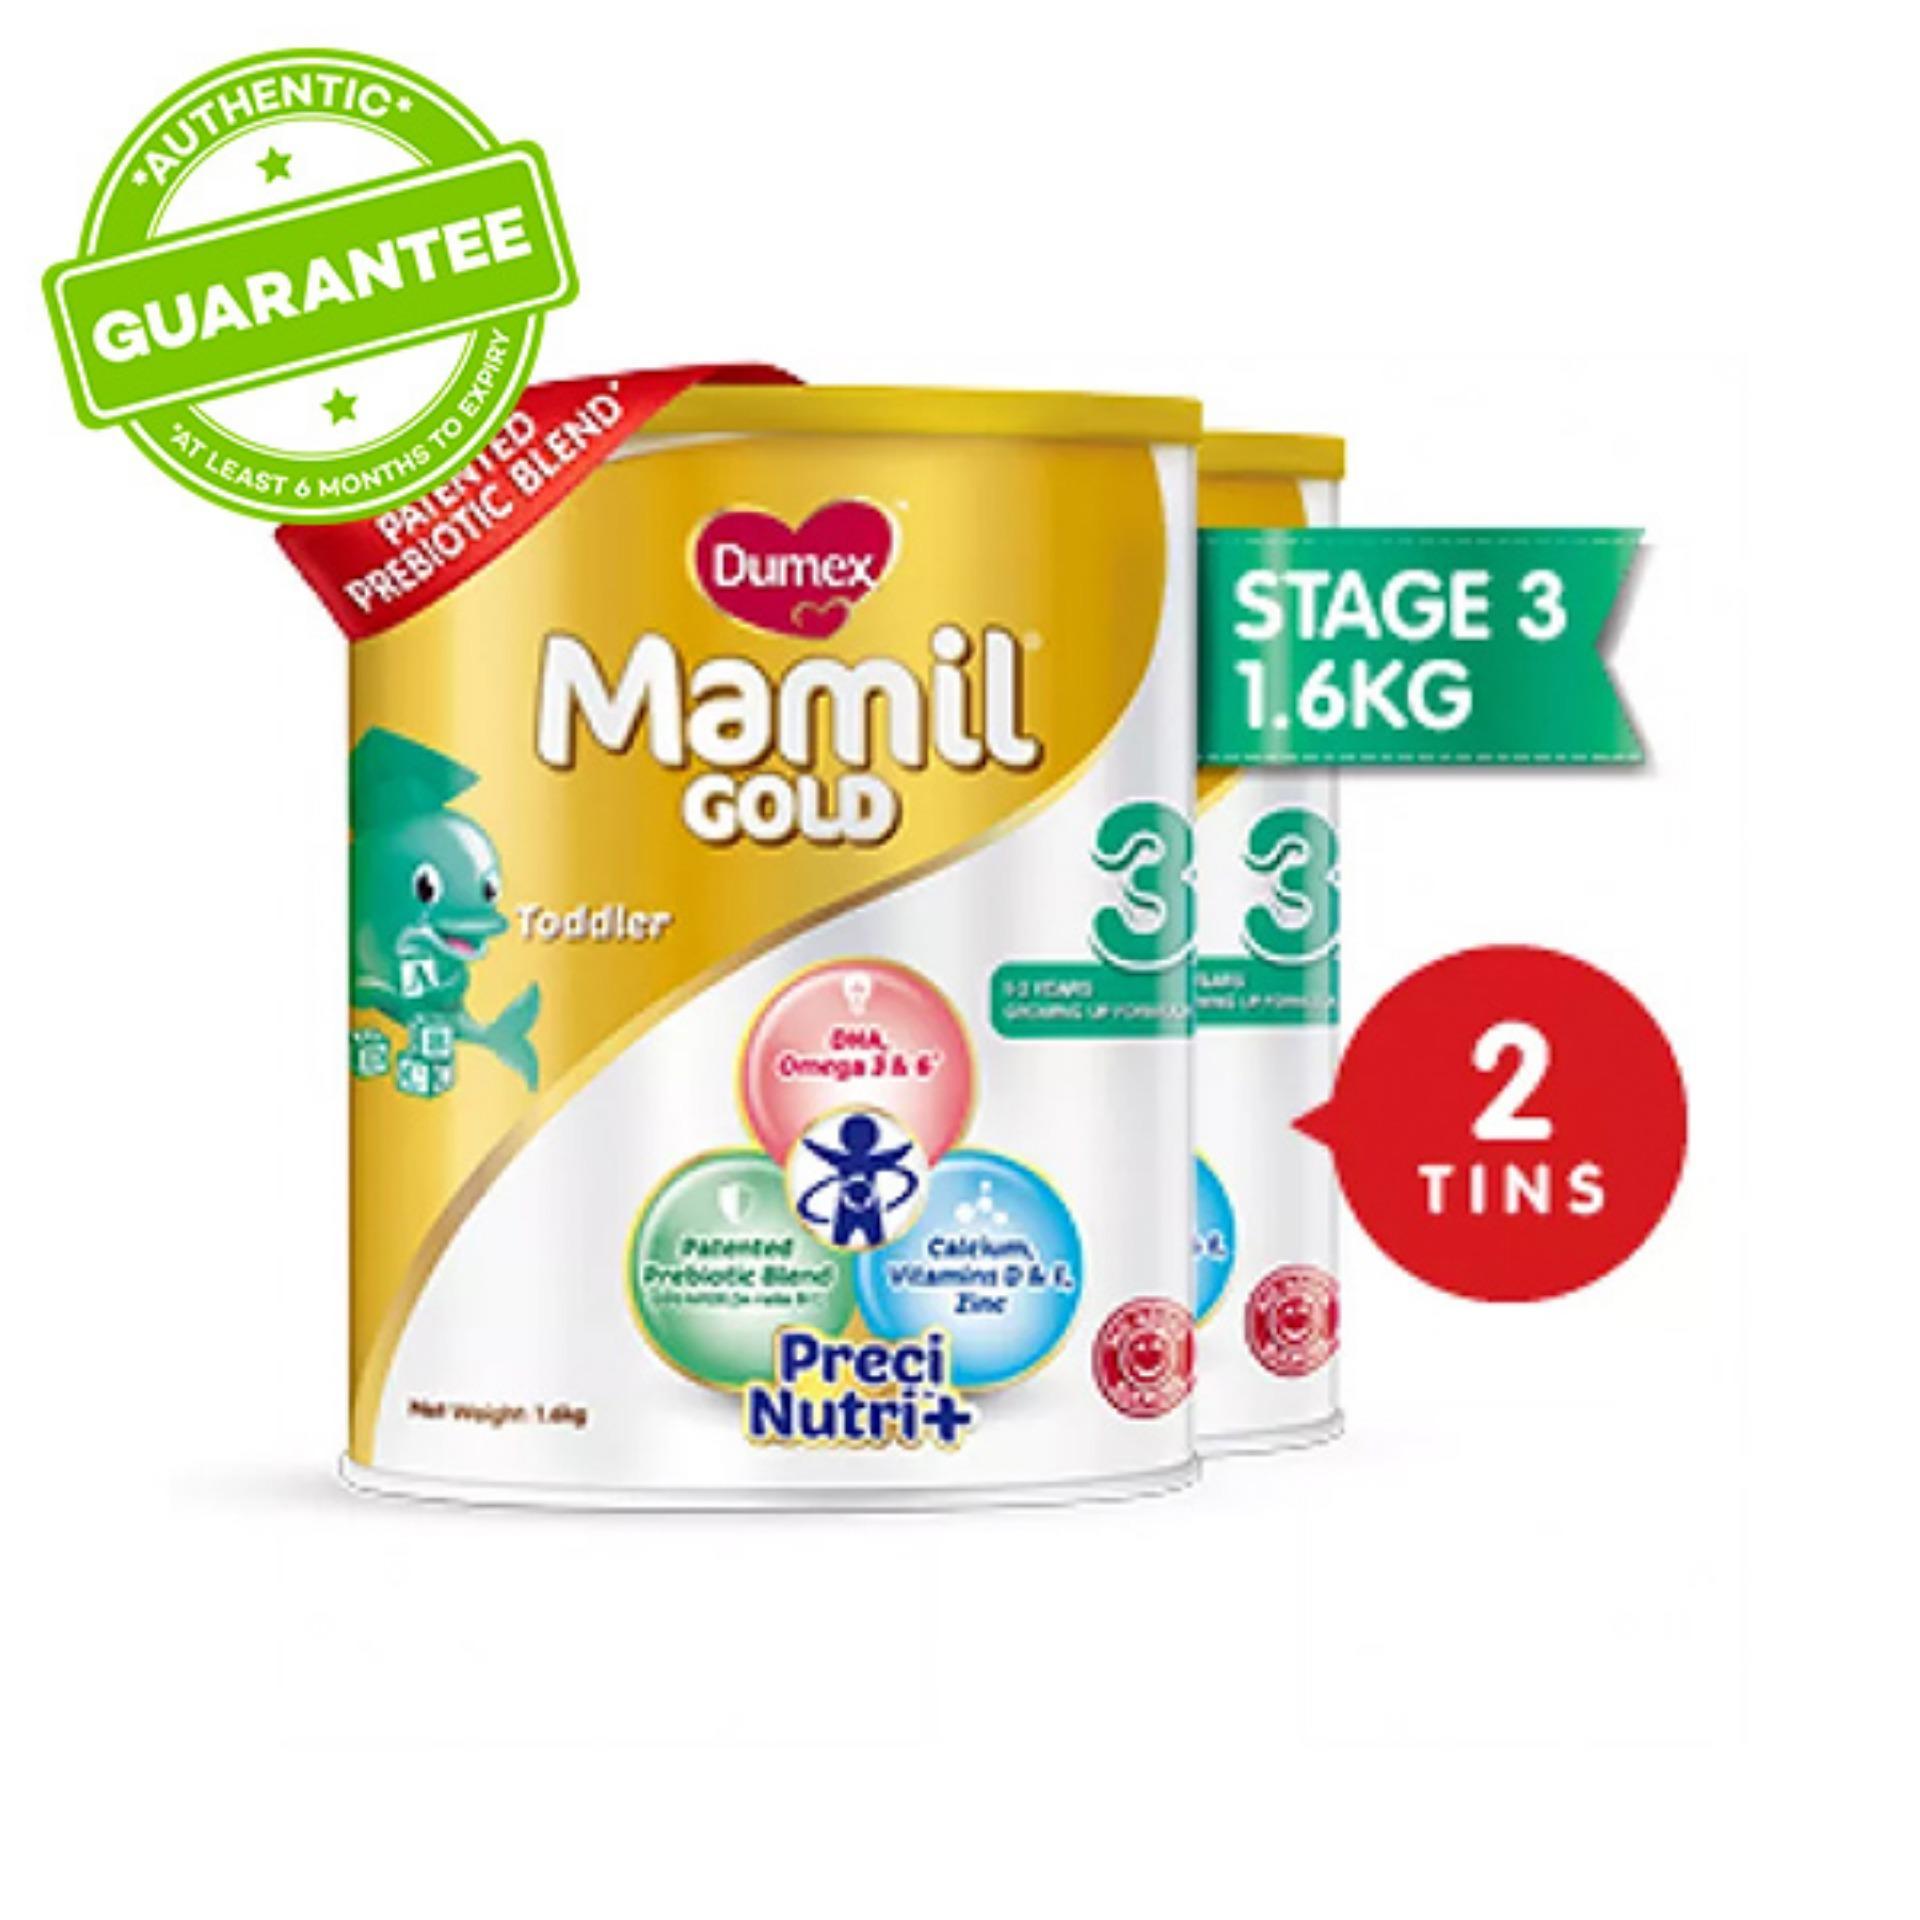 Dumex Mamil Gold Stage 3 Growing Up Baby Milk Formula (1.6kg) X 2 By Lazada Retail Dumex.